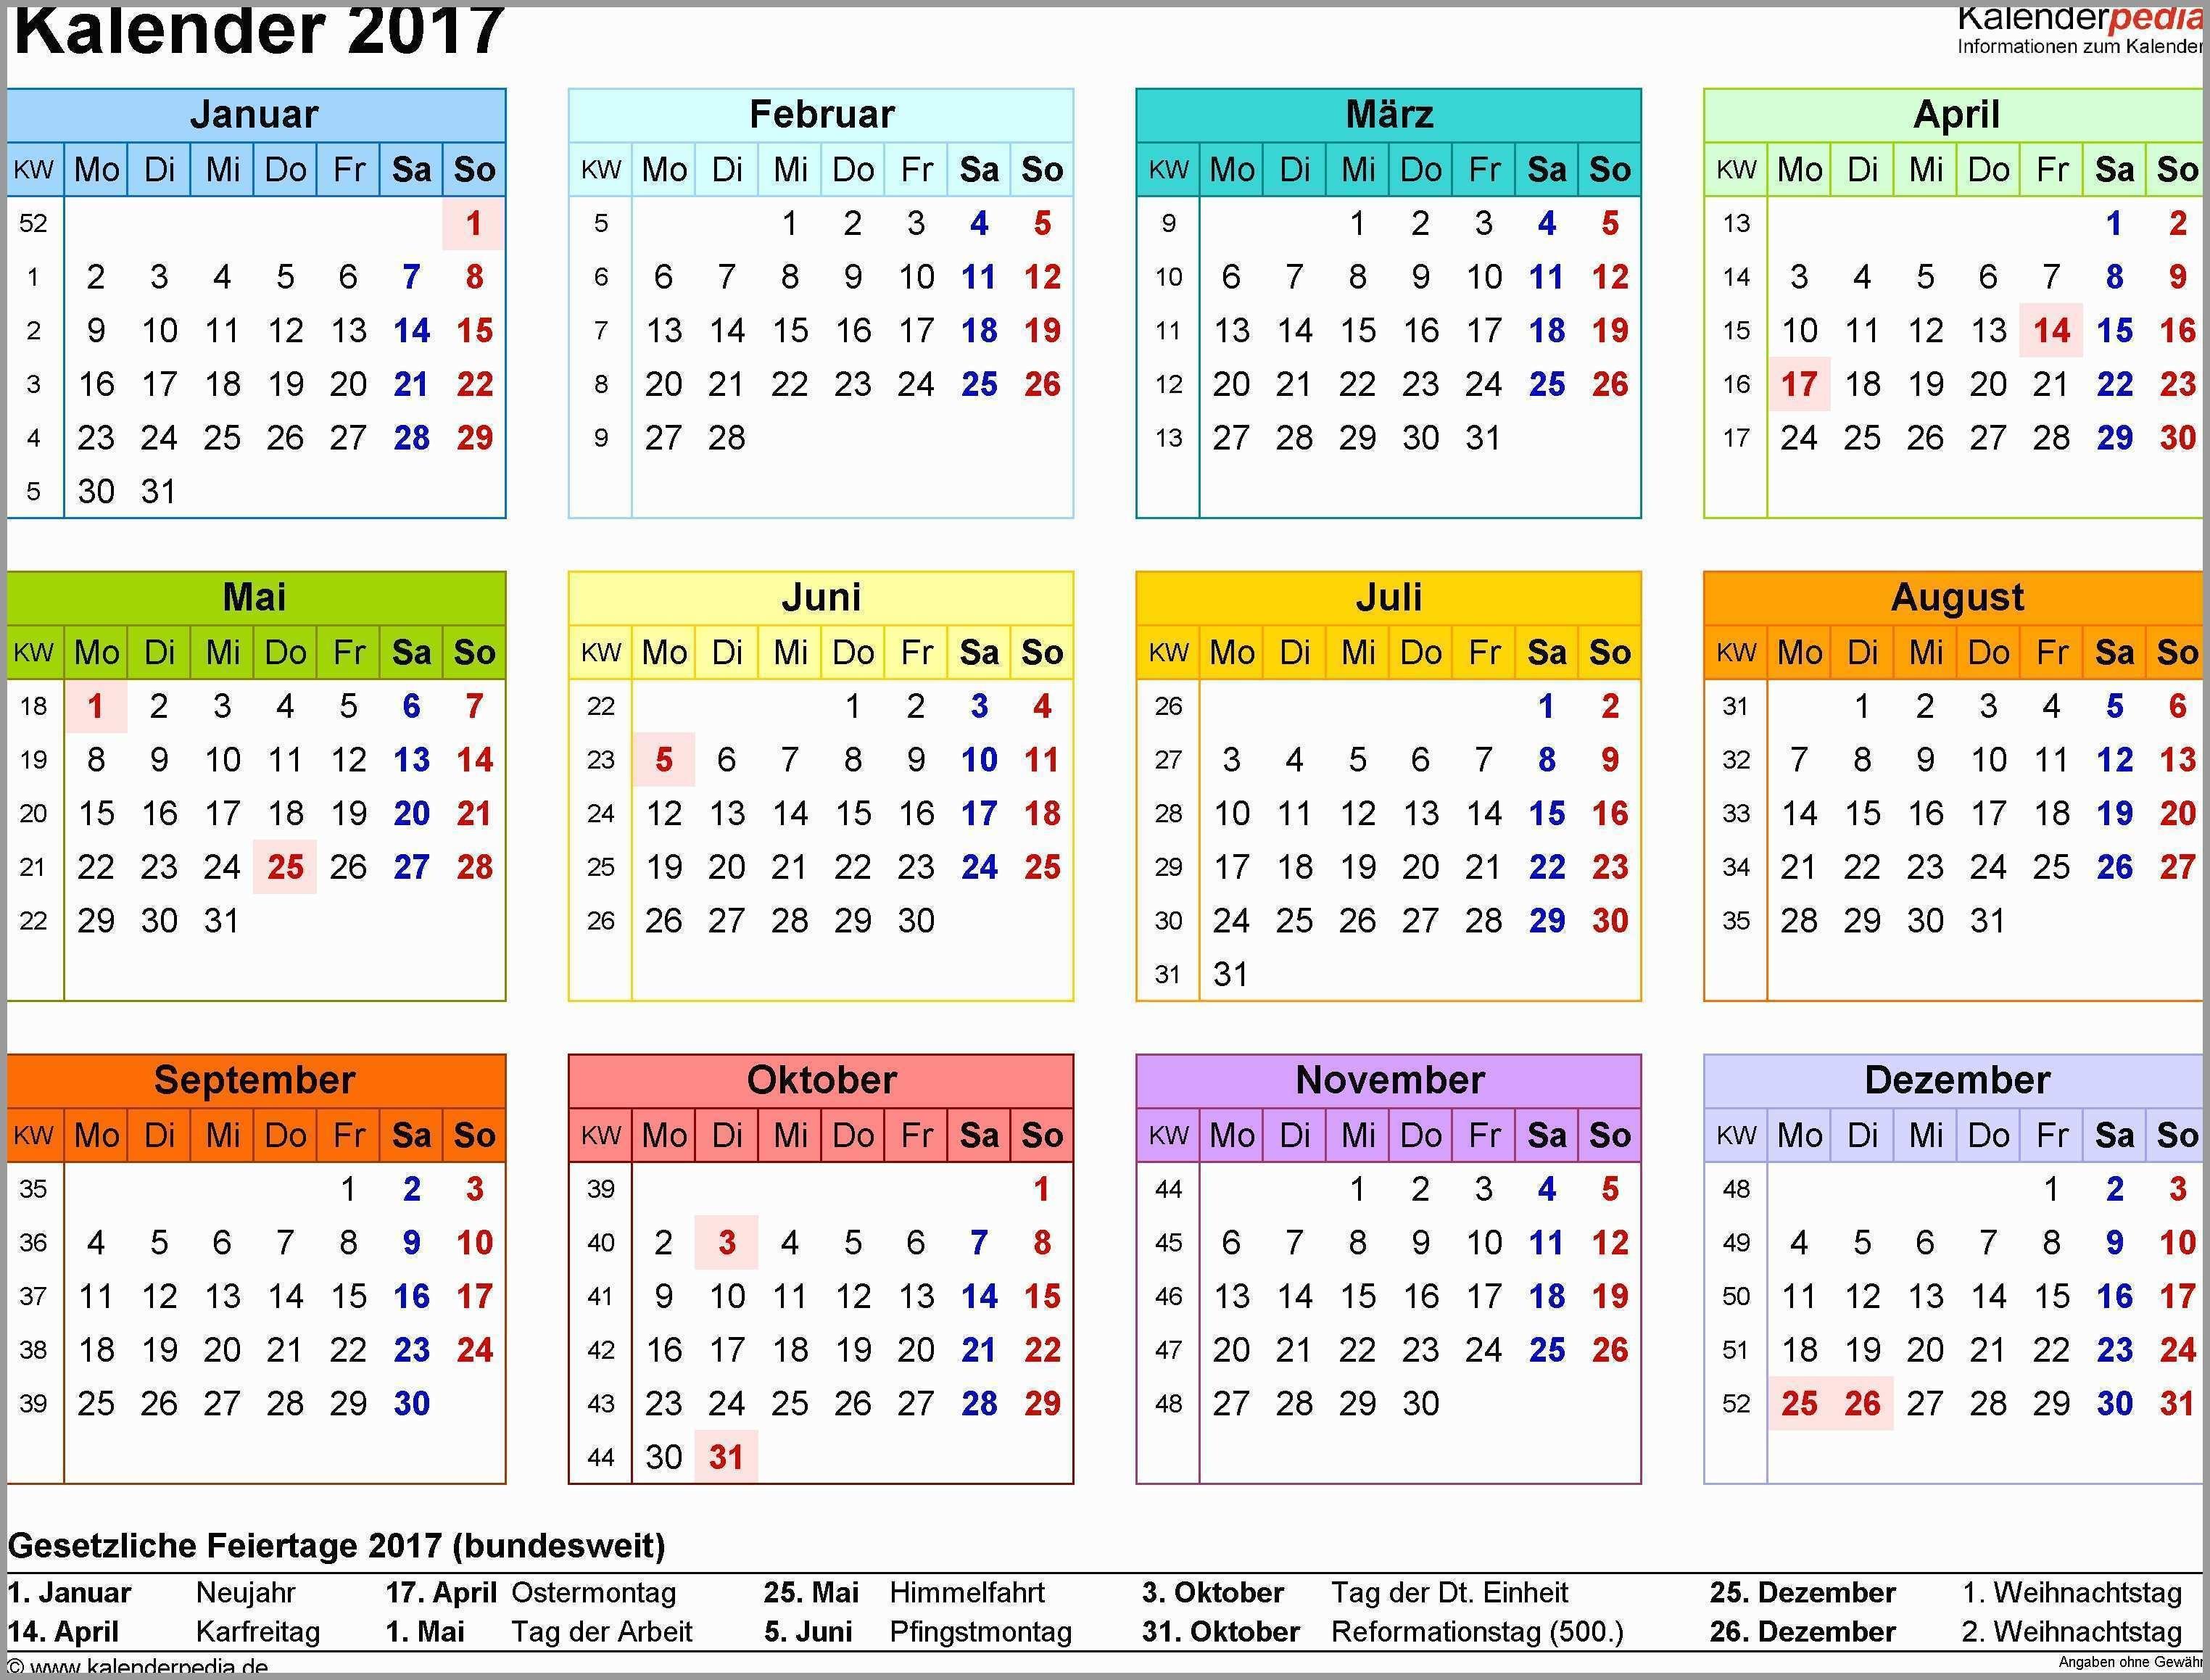 Calendario 2019 Juventus Más Recientemente Liberado Indesign Calendar Template 2017 Beautiful Indesign Calendar Template Of Calendario 2019 Juventus Recientes September 2019 Hindu Calendar 2019 Printable Yearly Calendar with